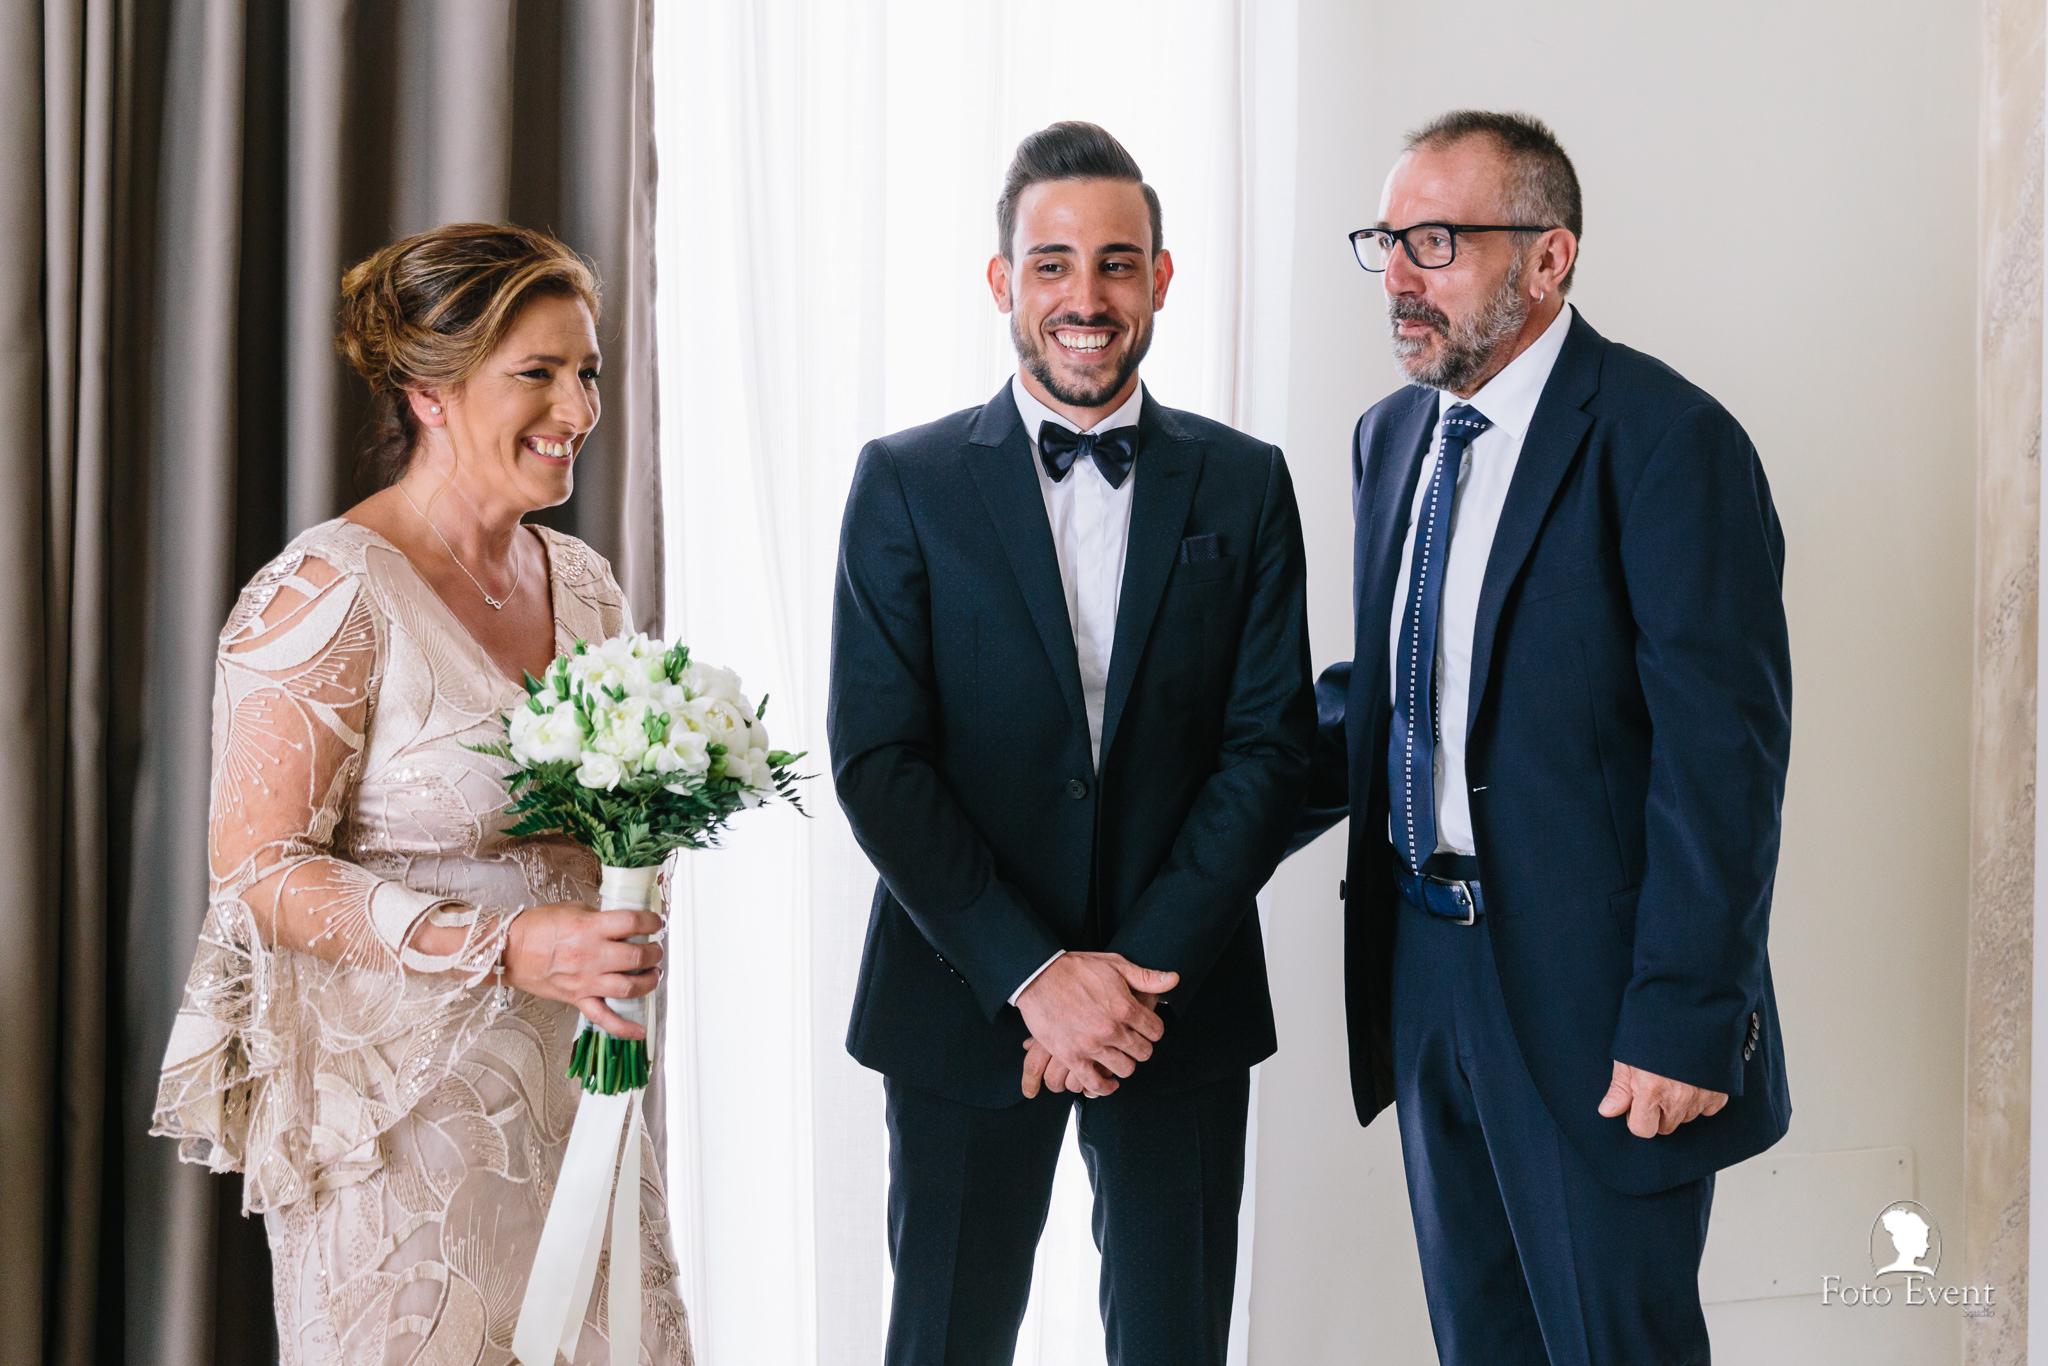 004-2019-08-31-Matrimonio-Serena-e-Saverio-Tarantino-5DE-116